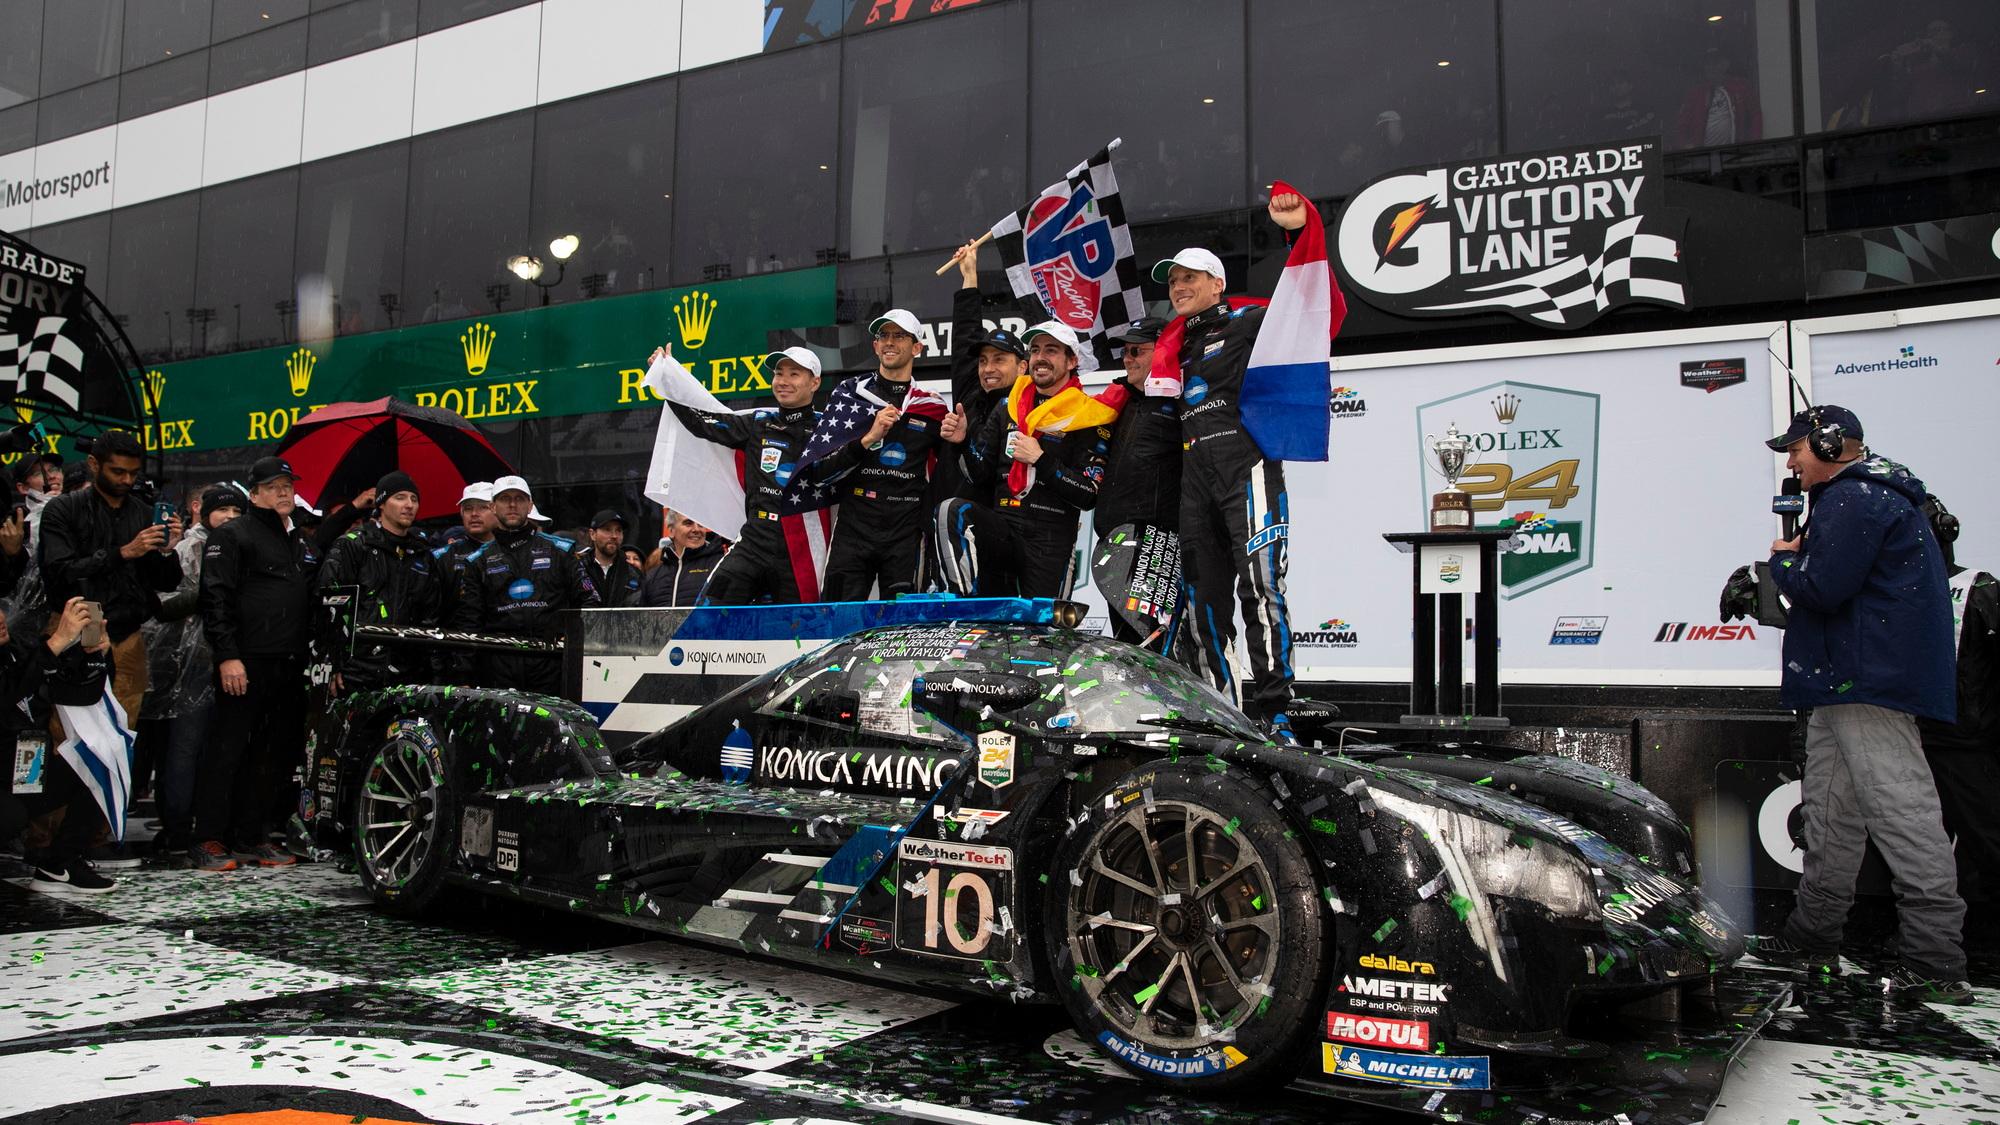 Konica Minolta Cadillac DPi-V.R wins 2019 Rolex 24 at Daytona